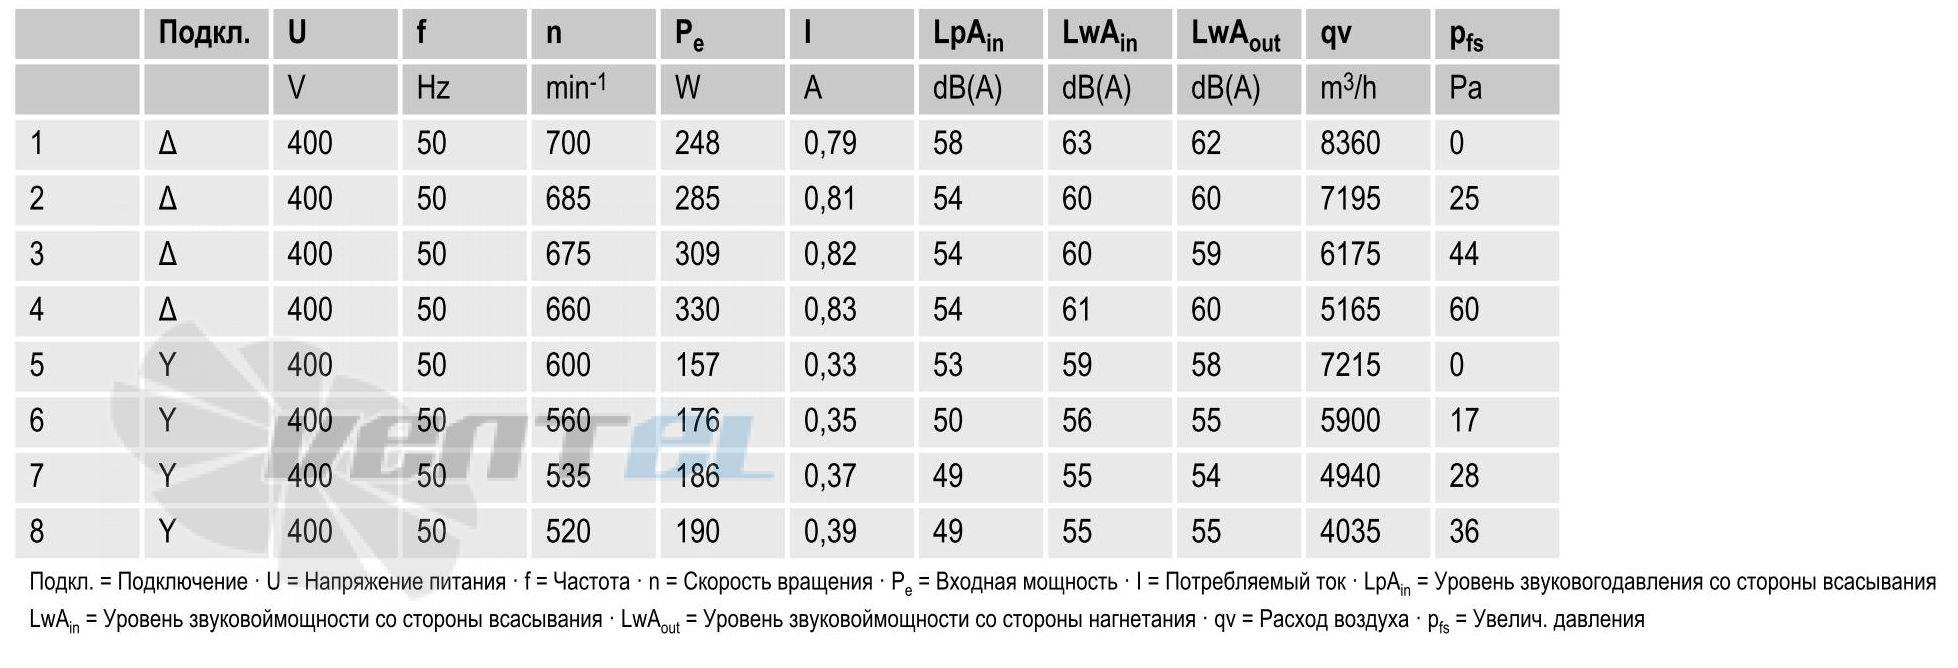 вентиляторы S8D630-AN01-01 параметры и характеристики